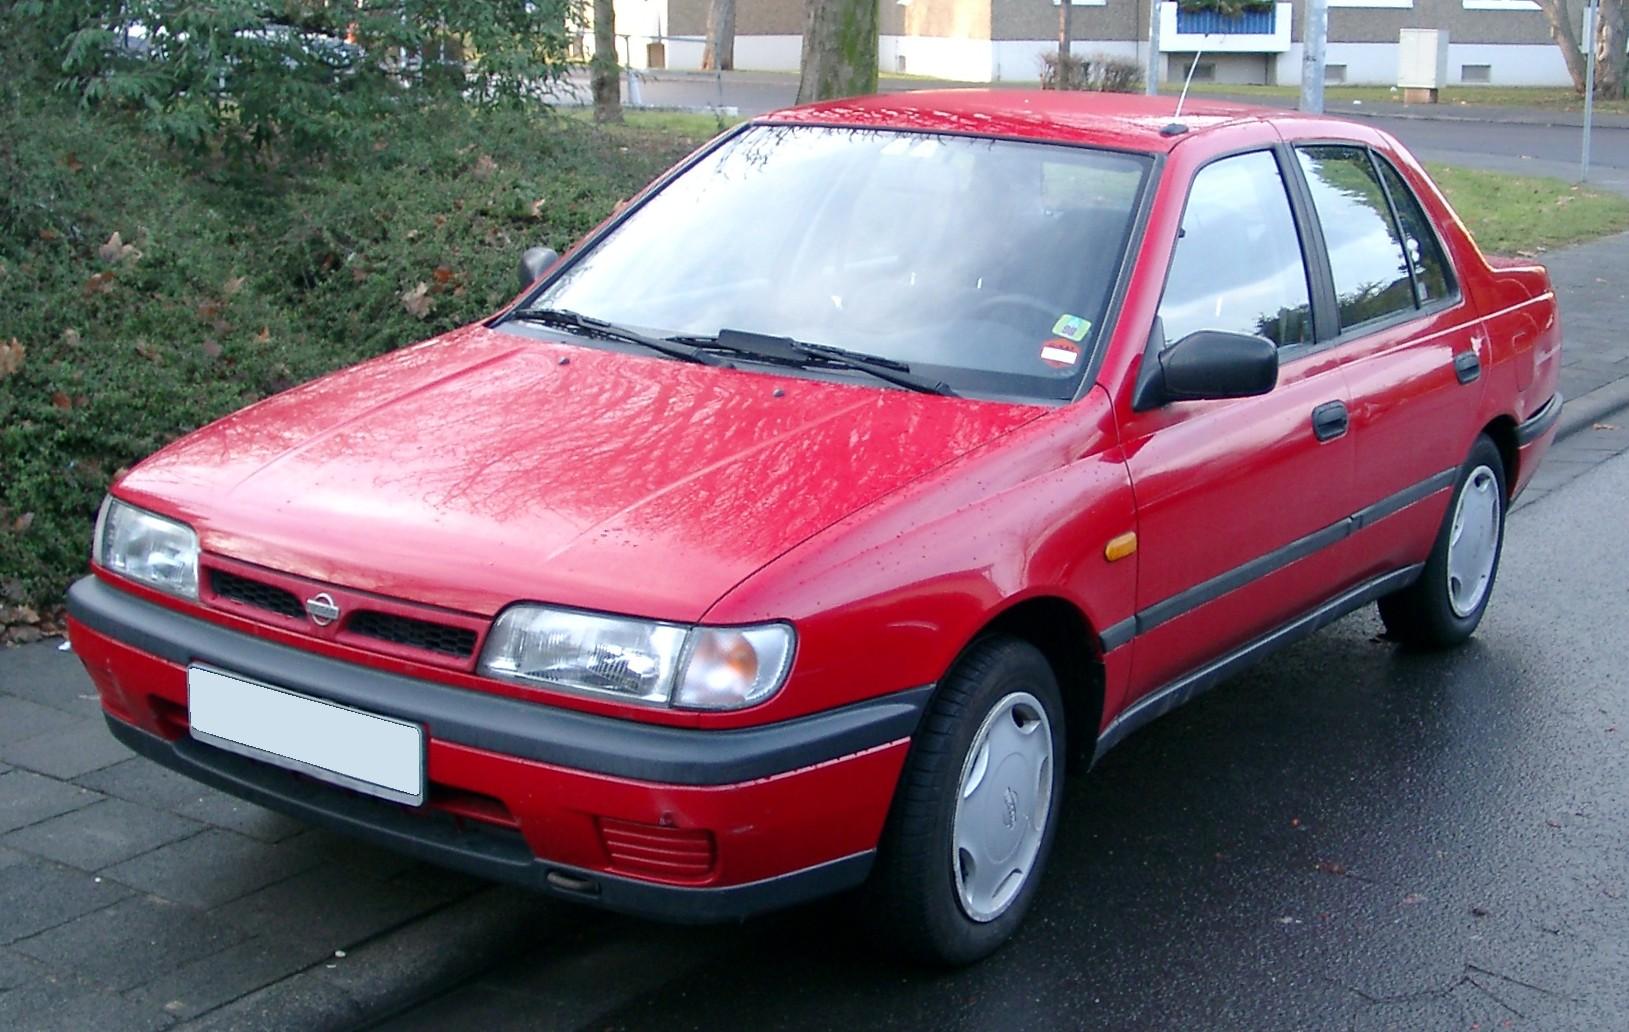 1995 Nissan Sunny Partsopen